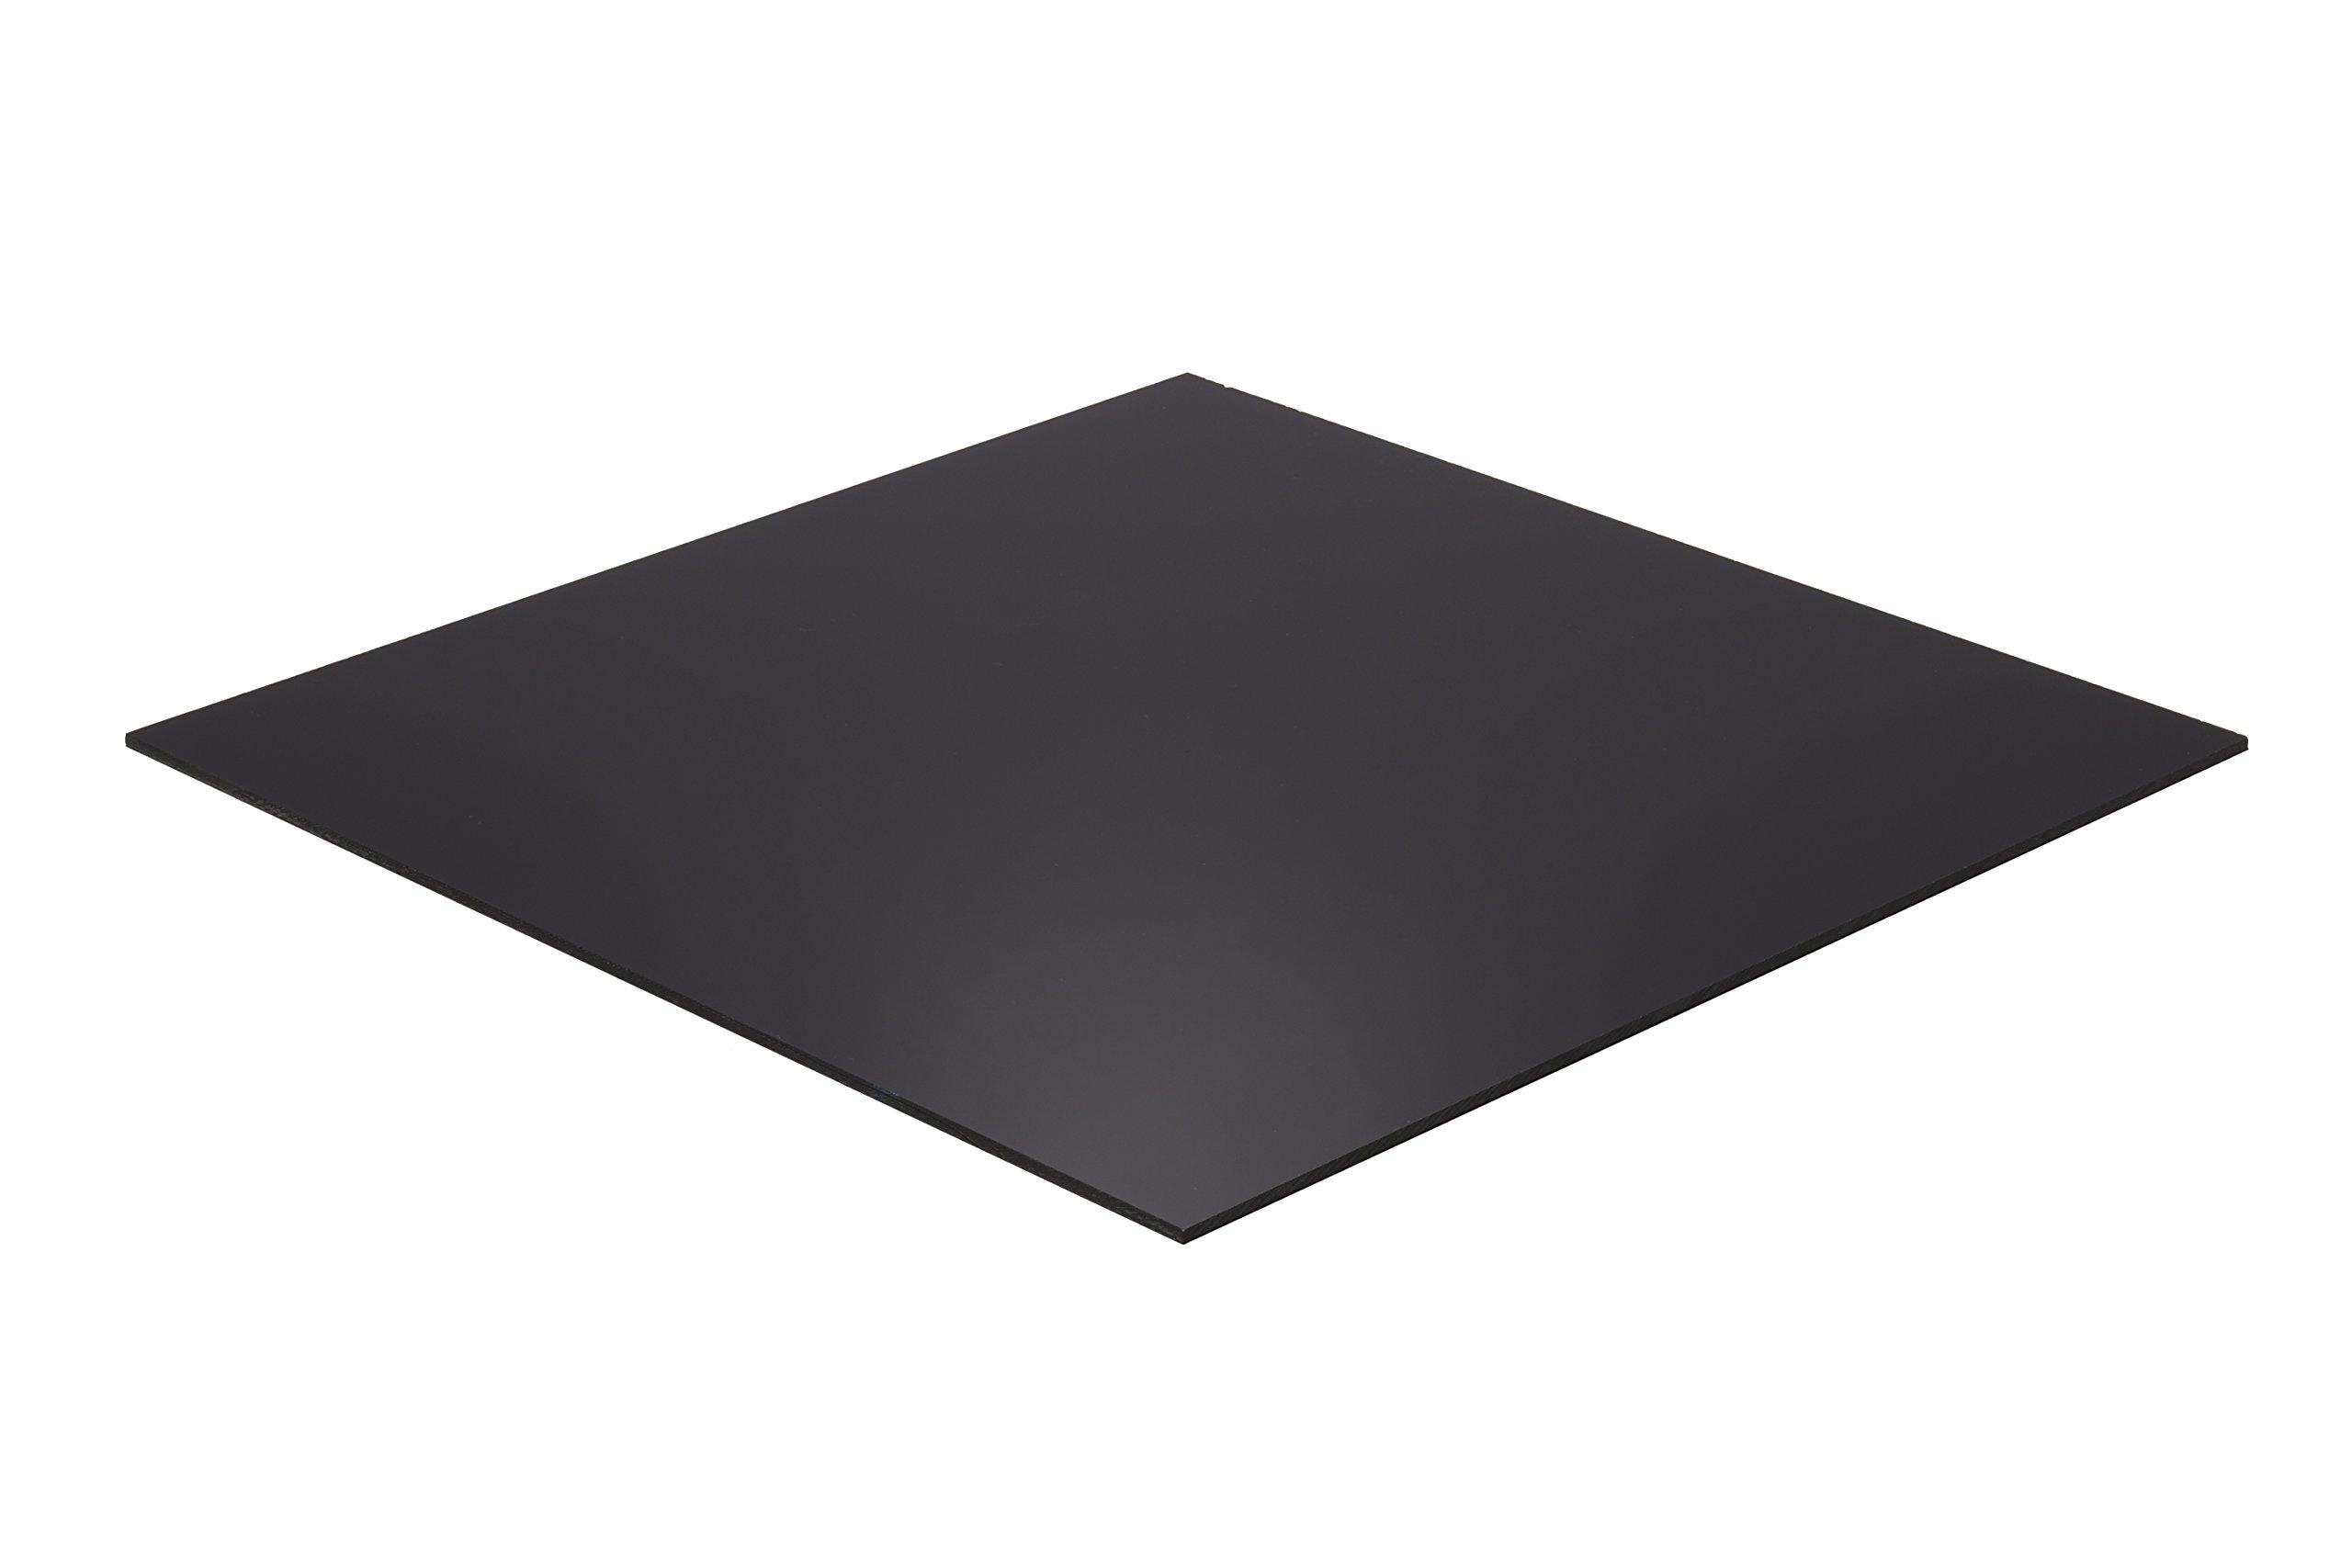 Falken Design BK2025-1-8/1224 Acrylic Black Sheet, 12'' x 24'', 1/8'' Thick by Falken Design Corporation